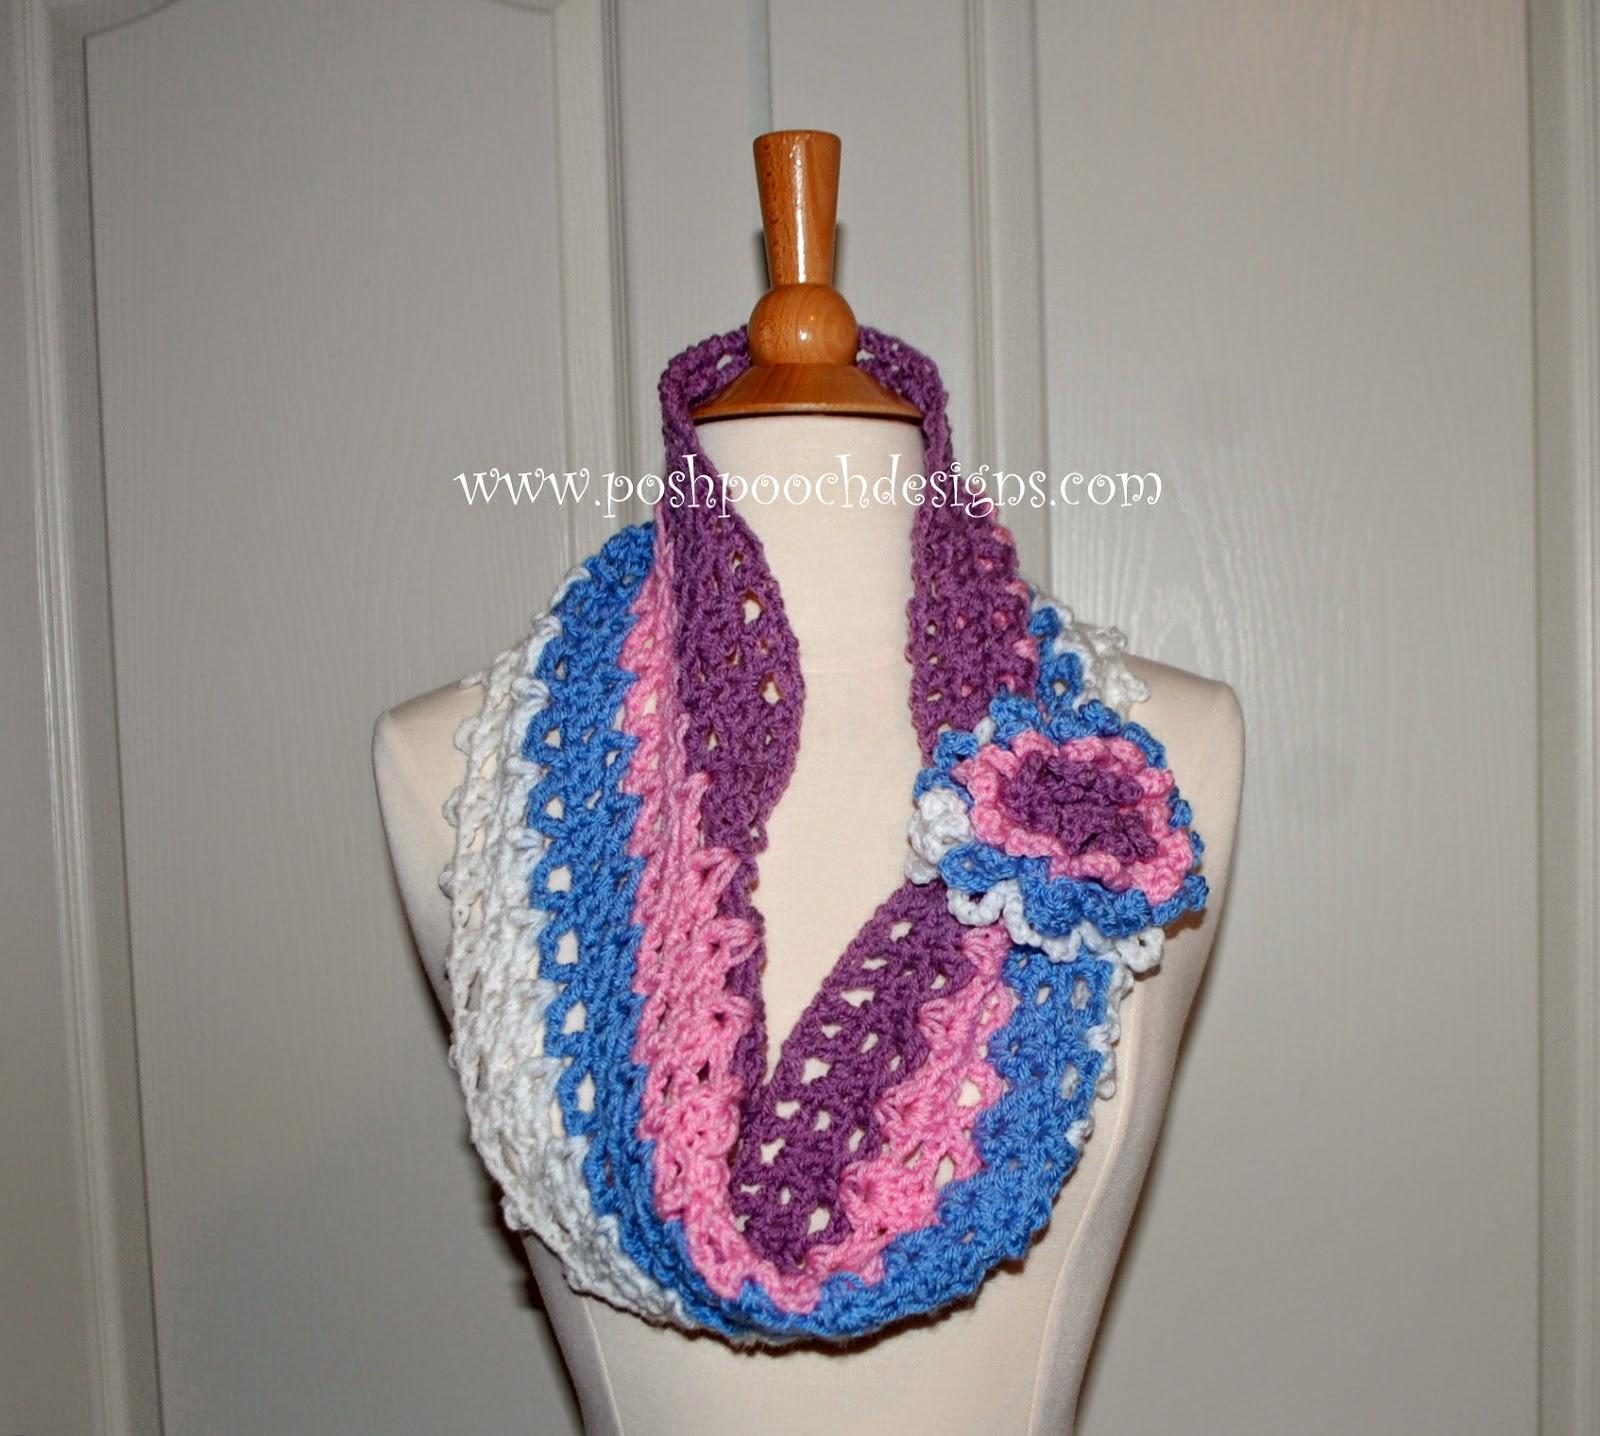 Posh Pooch Designs Dog Clothes: Spring Colors Cowl Free Crochet ...